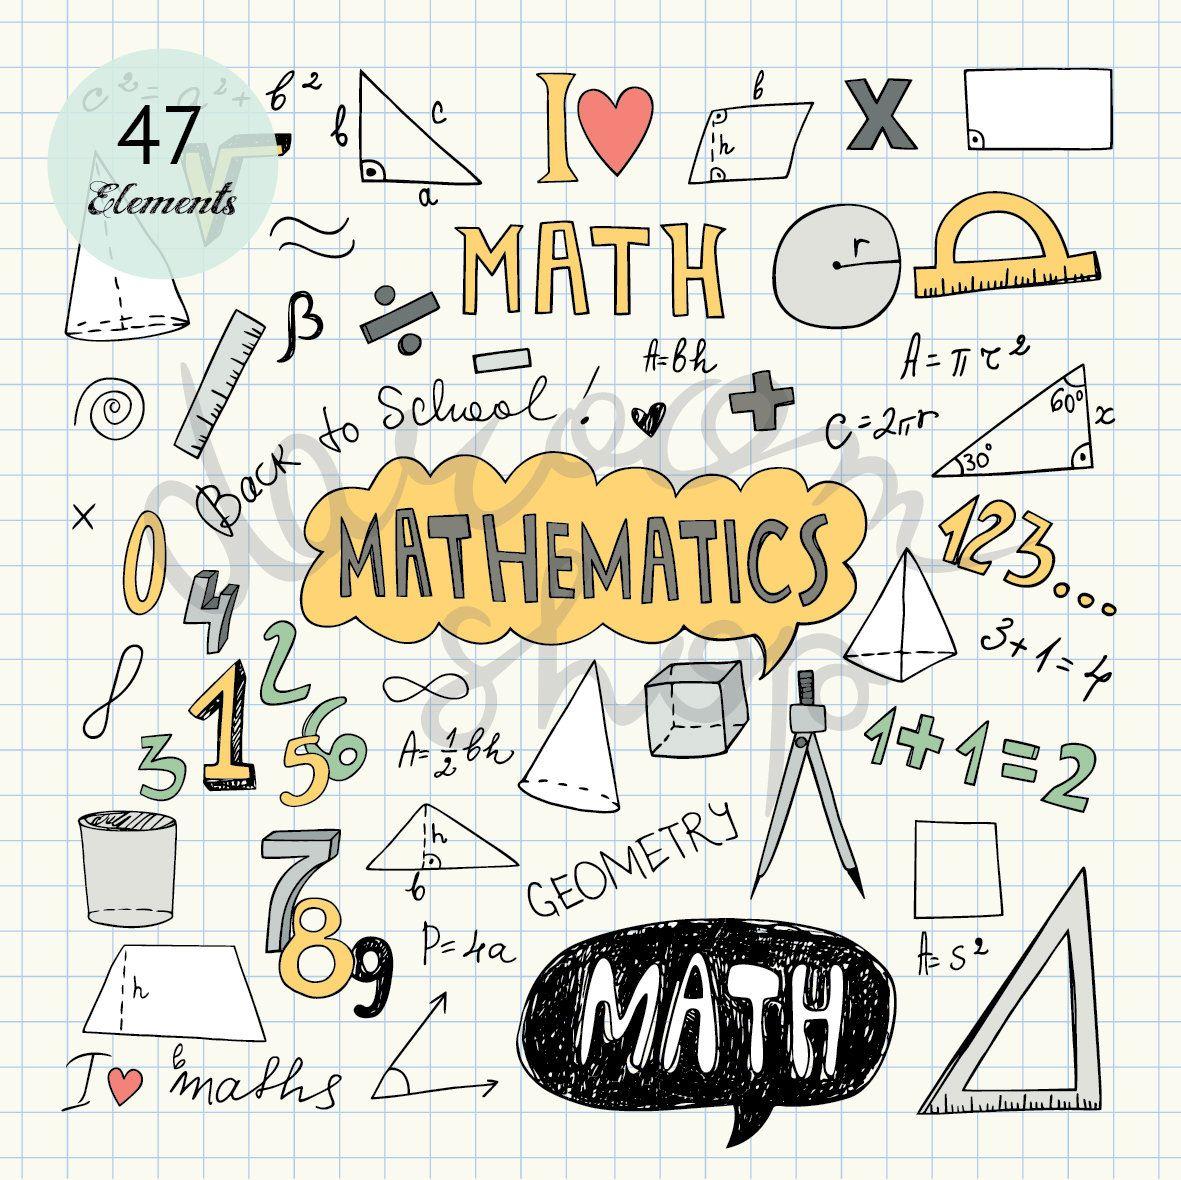 Hand Drawn Mathematics Clip Art Math Elements And Symbols Back To School Doodle Educational Collection Vector Eps Png Digital Download Buku Kliping Sampul Buku Sekolah Lucu